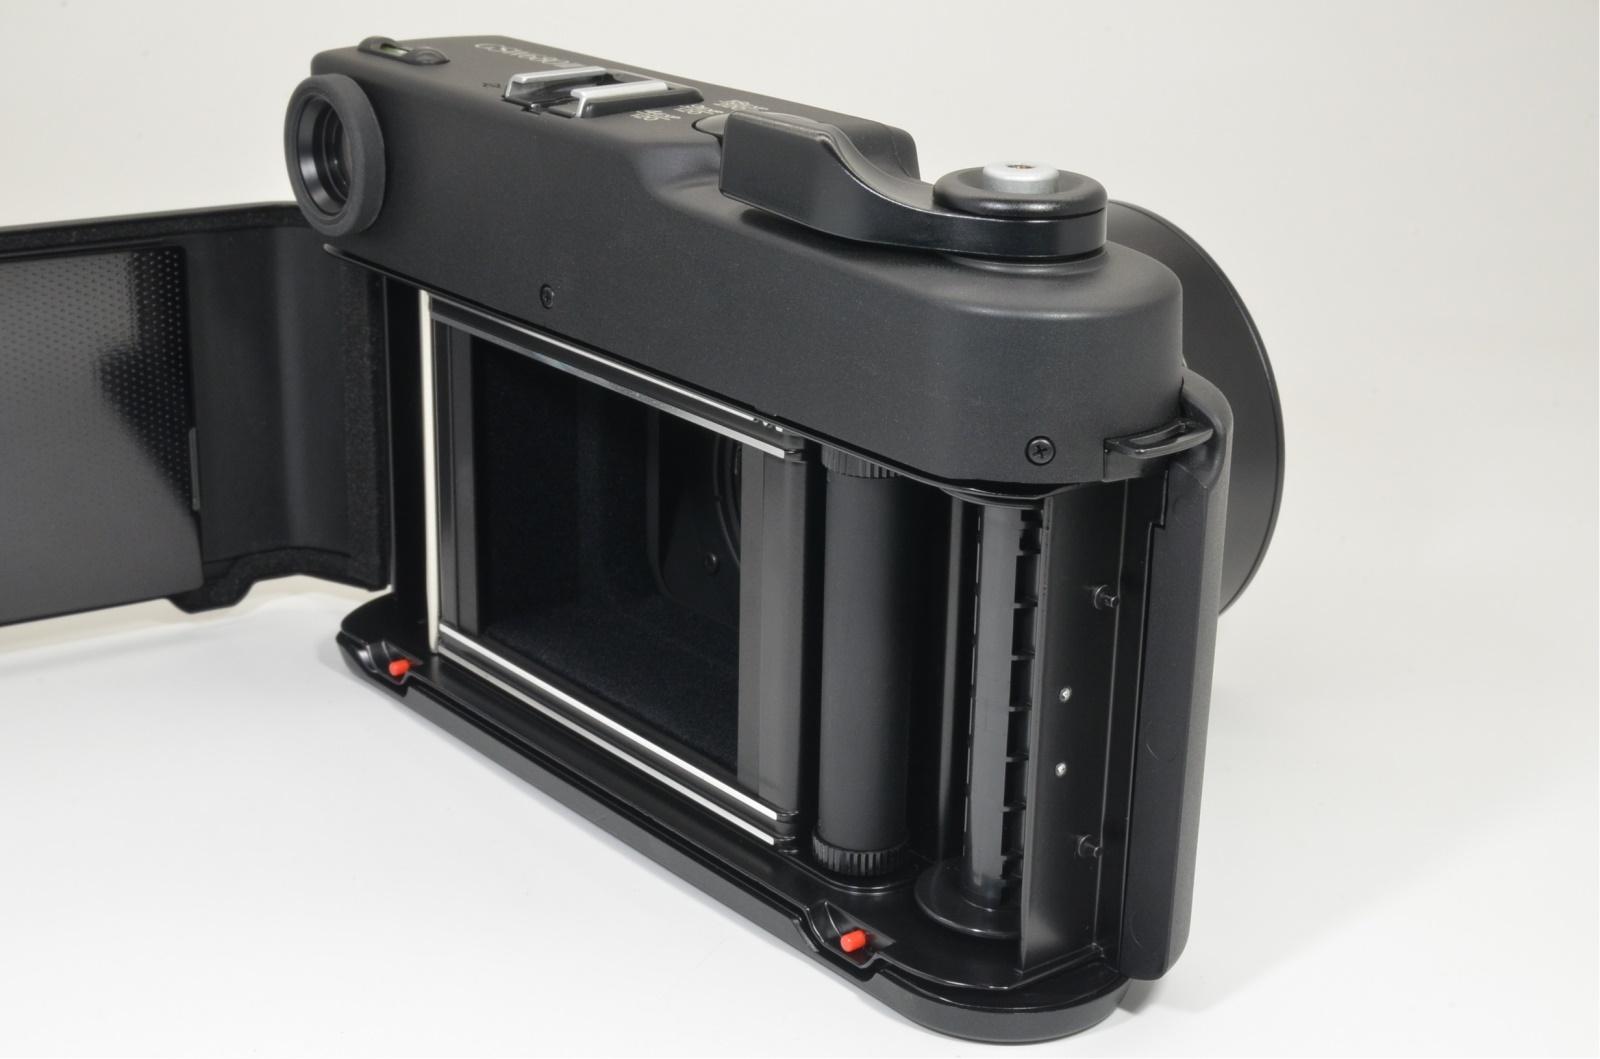 fuji fujifilm gsw680iii 65mm f5.6 count 050 medium format camera shooting tested